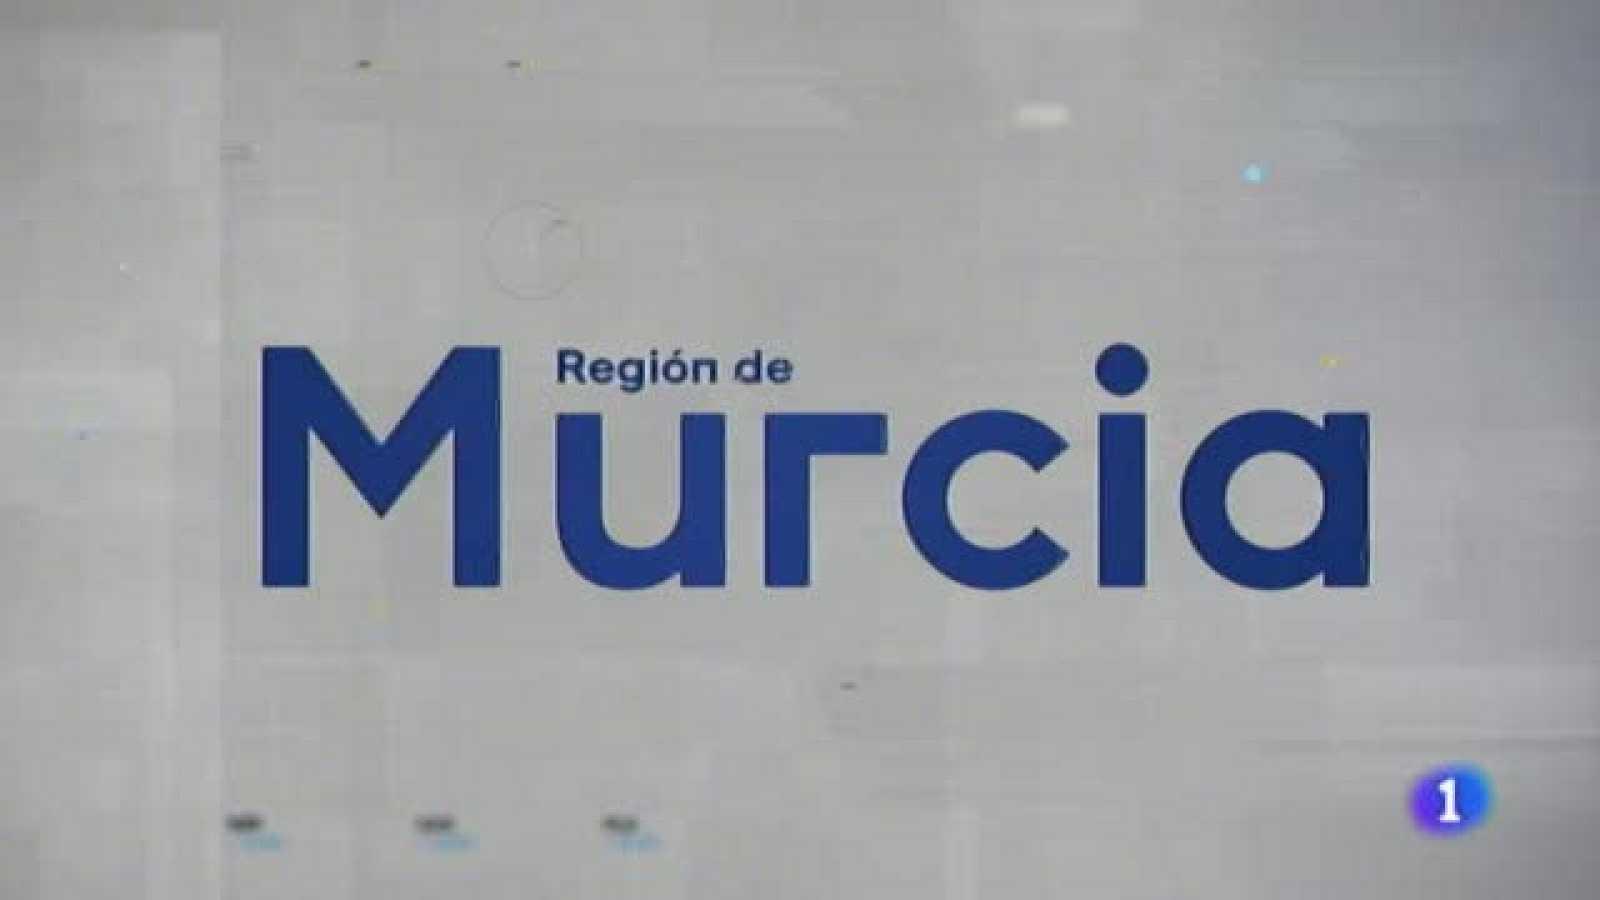 Noticias Murcia 2 - 18/05/2021